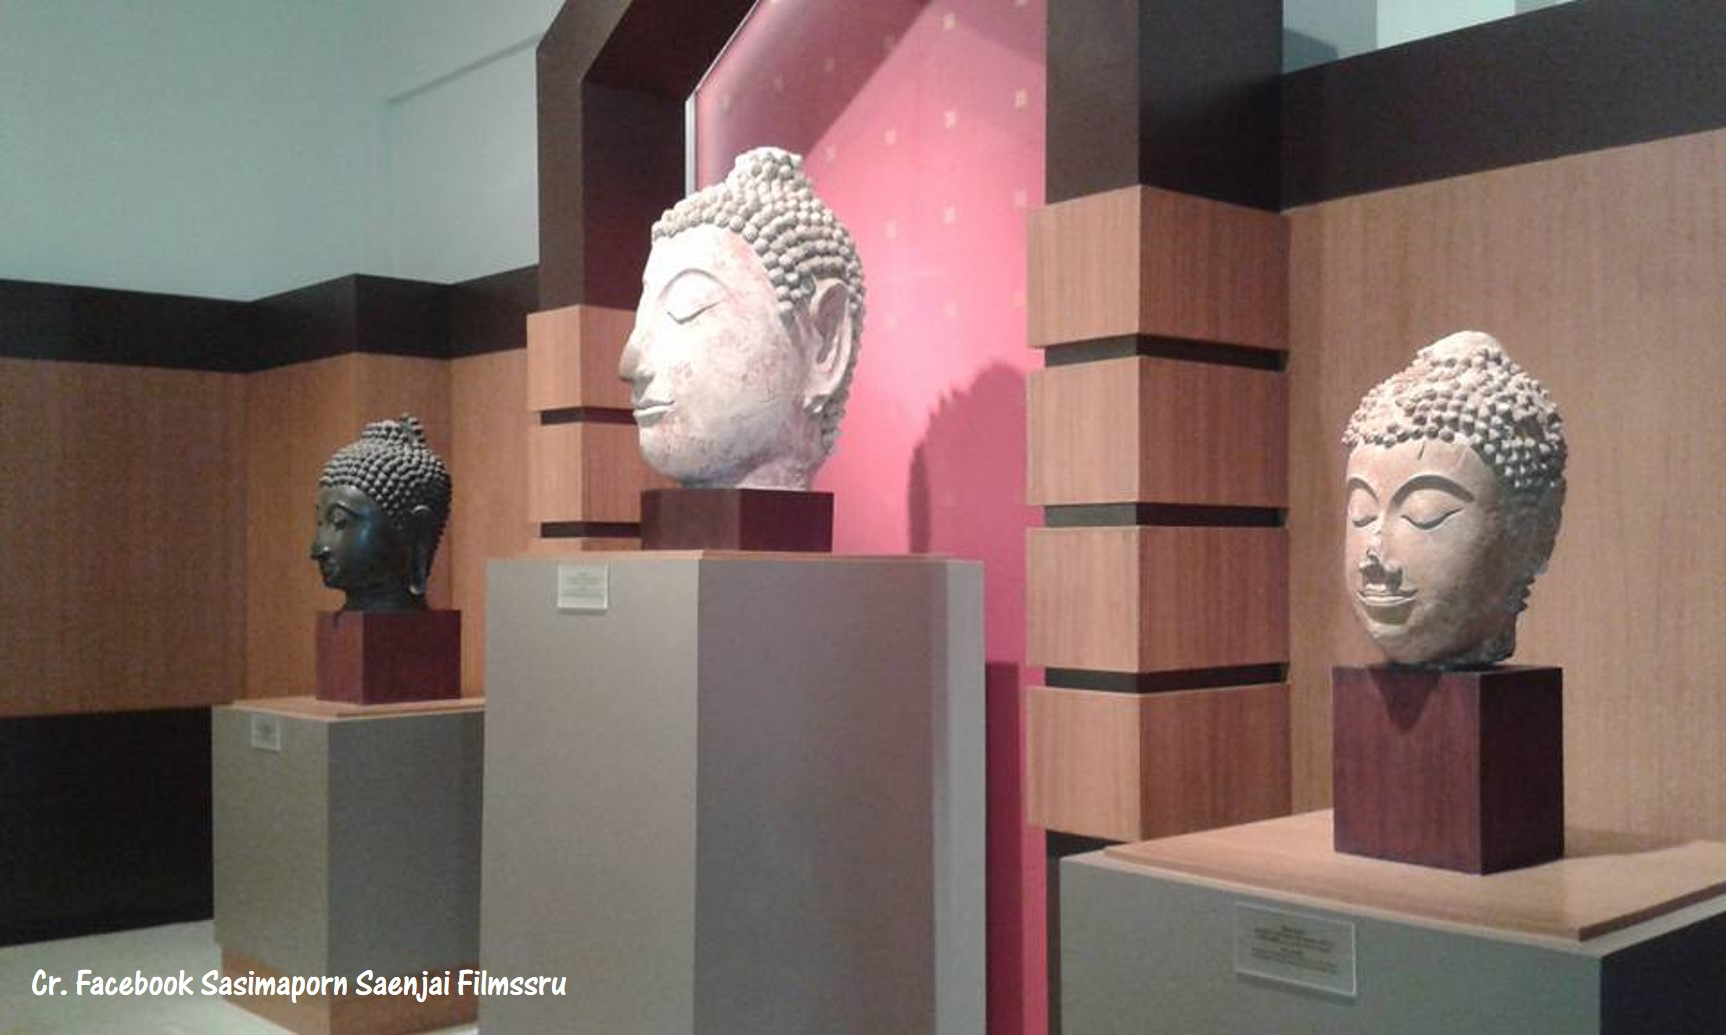 Kamphaeng Phet National Museum (พิพิธภัณฑ์แห่งชาติกำแพงเพชร)